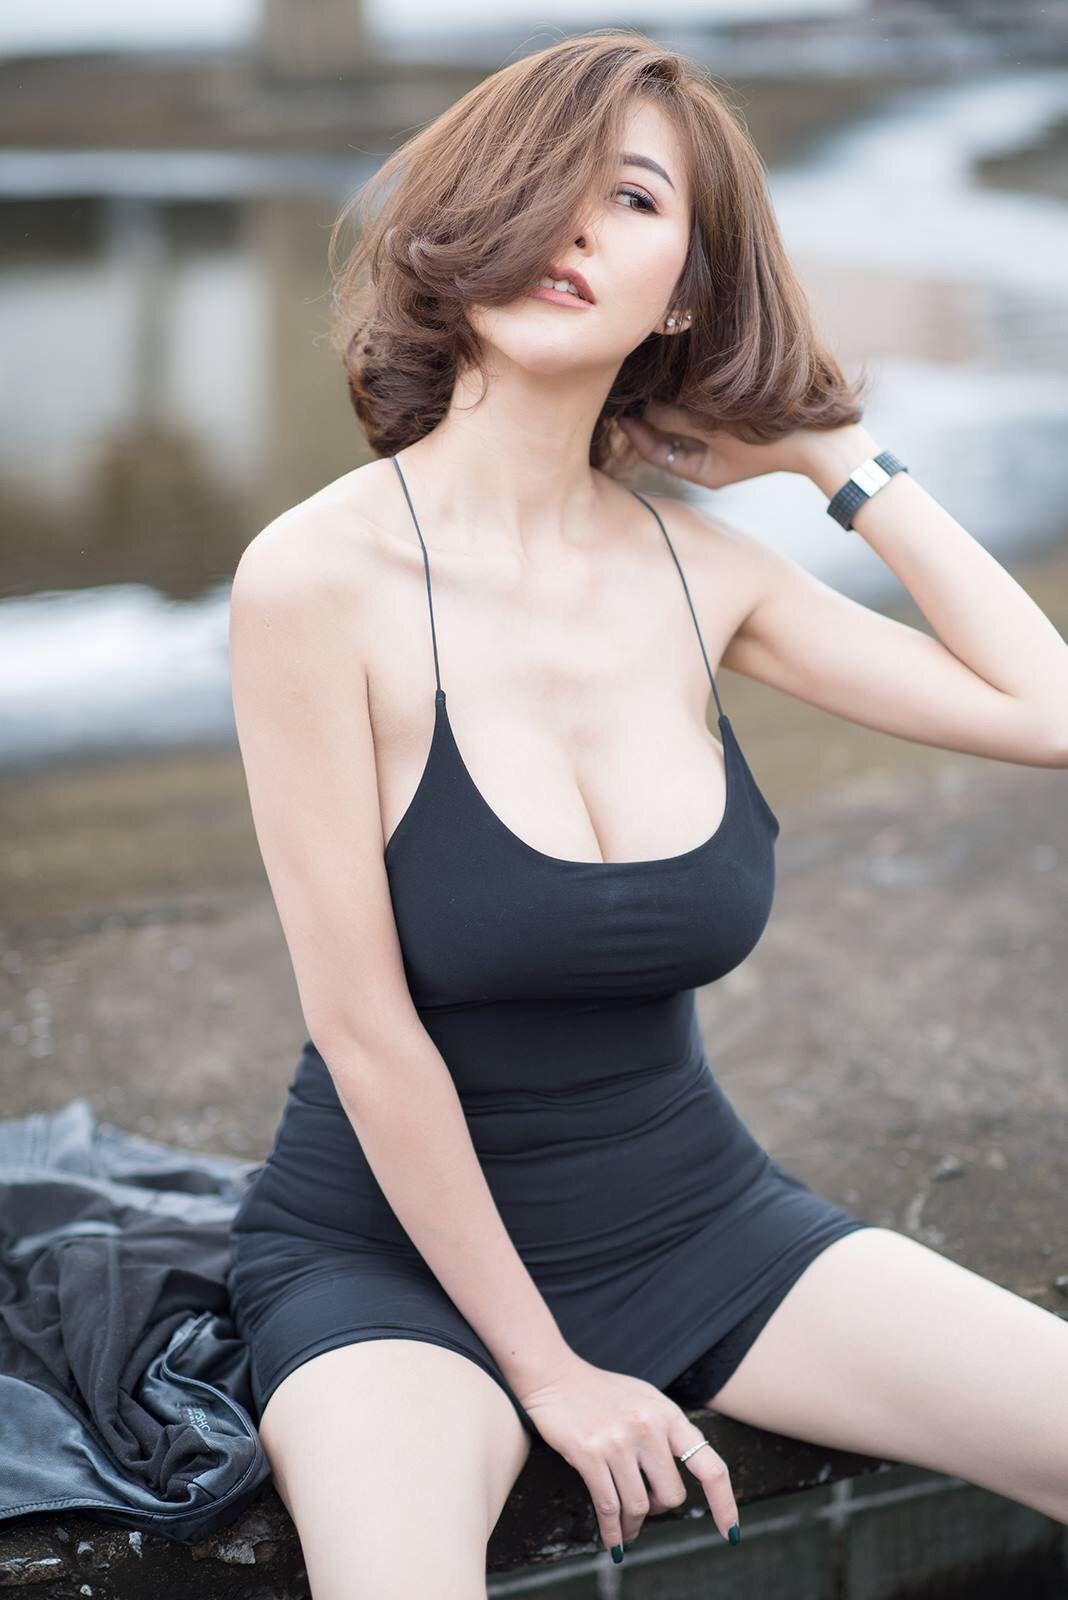 Busty Asian Teen Uncensored